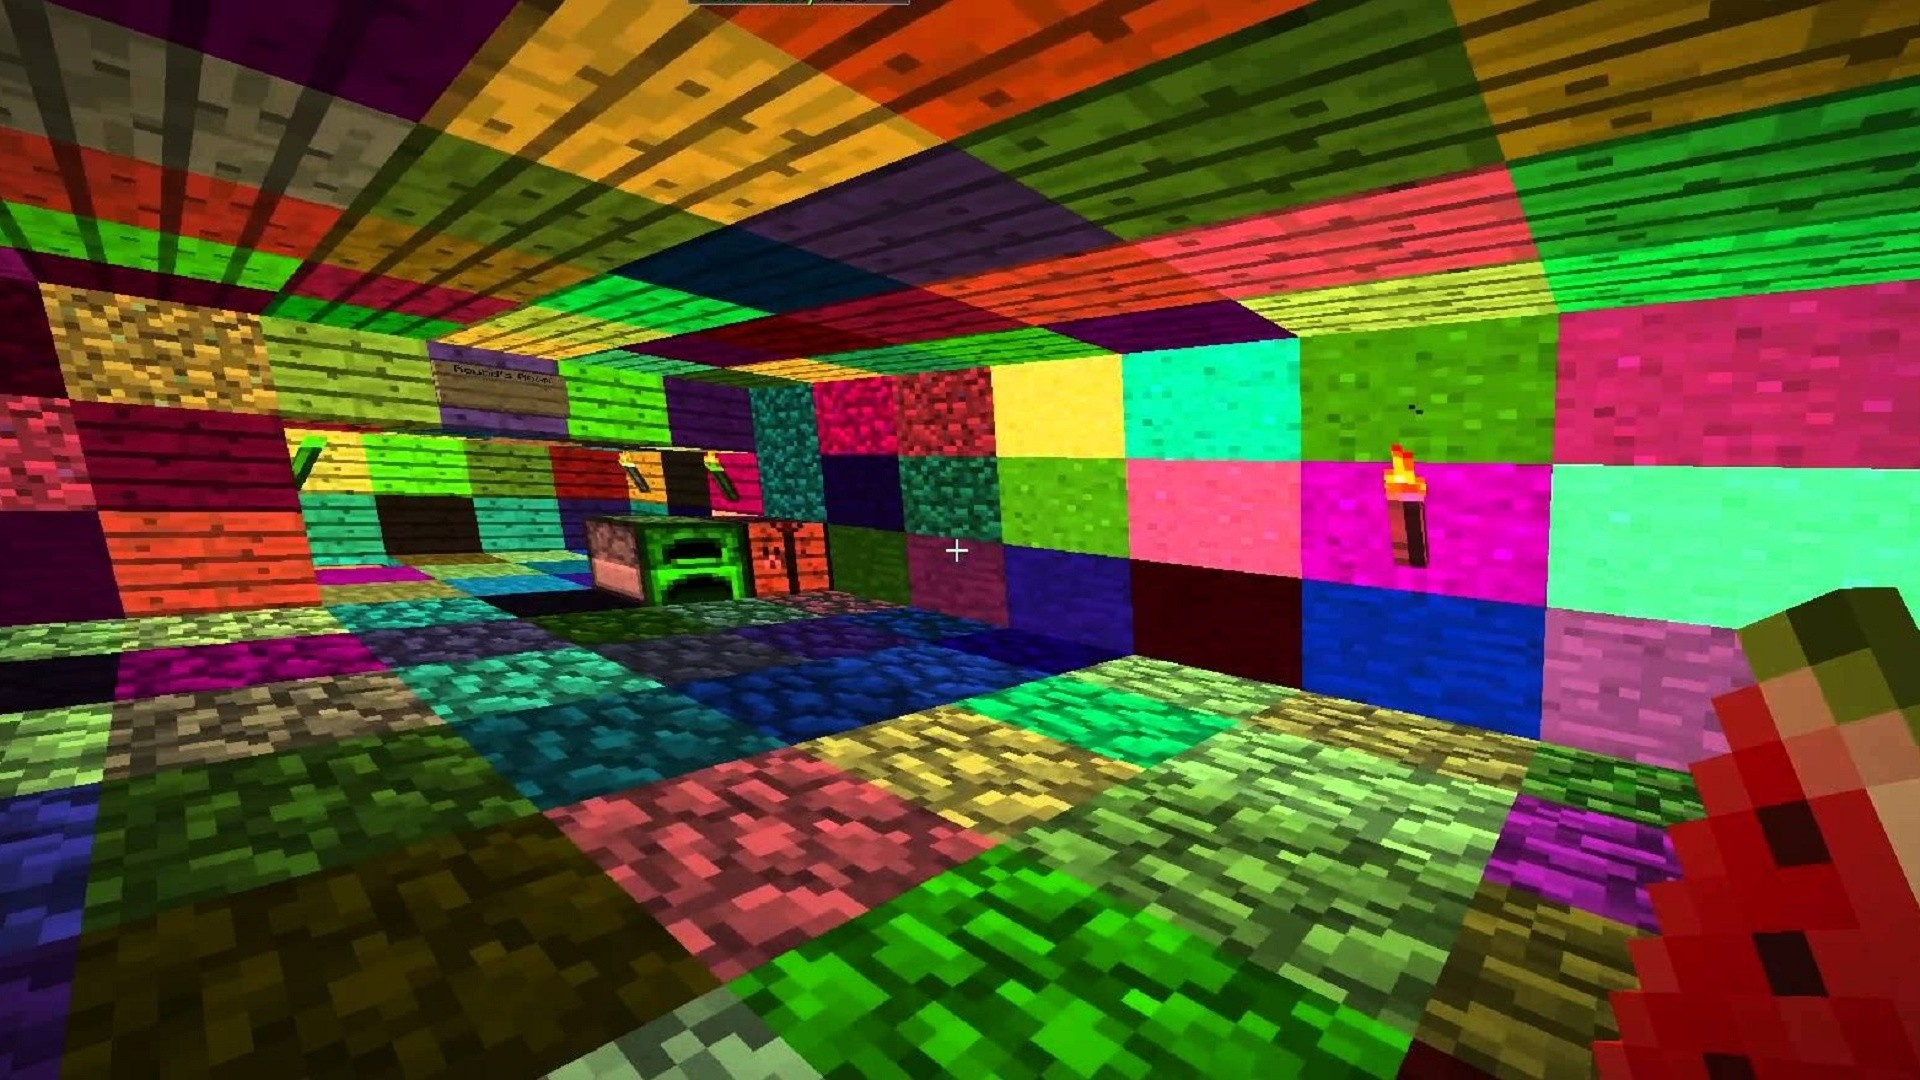 Lsd, Minecraft, Minecraft Lsd